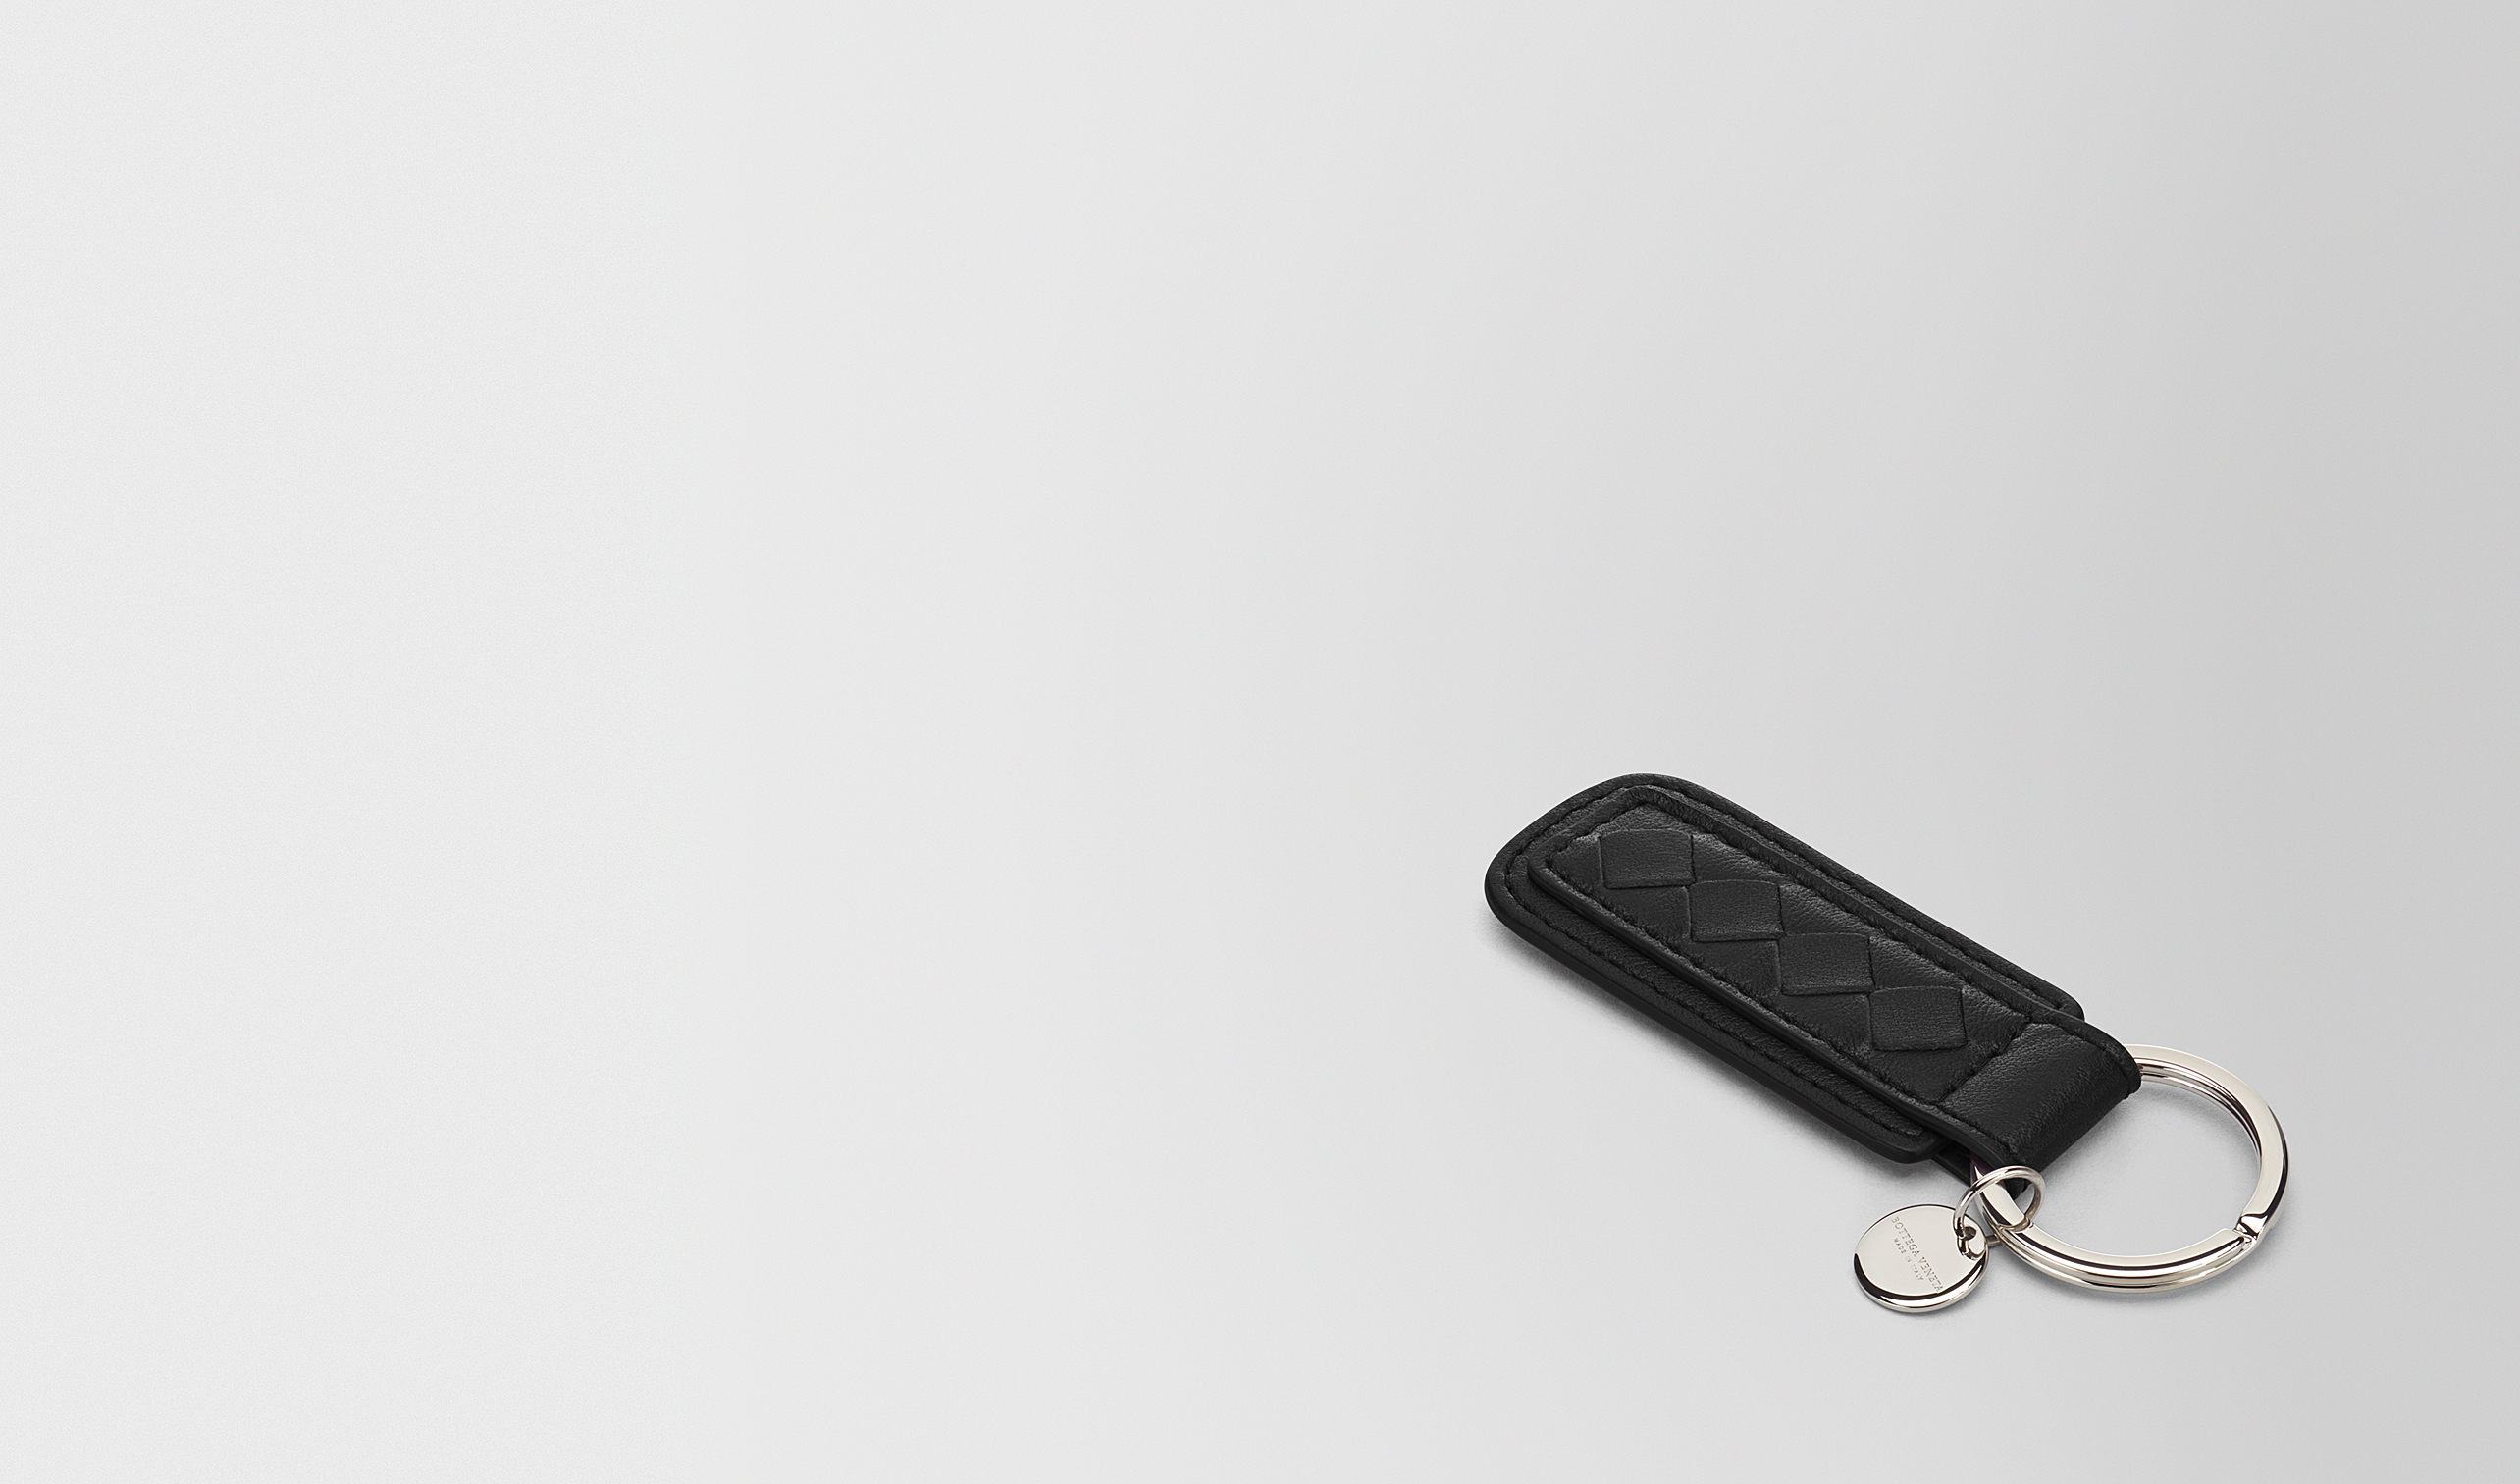 BOTTEGA VENETA Porte-clé ou Bracelet E PORTE-CLÉS EN INTRECCIATO NAPPA NERO pl